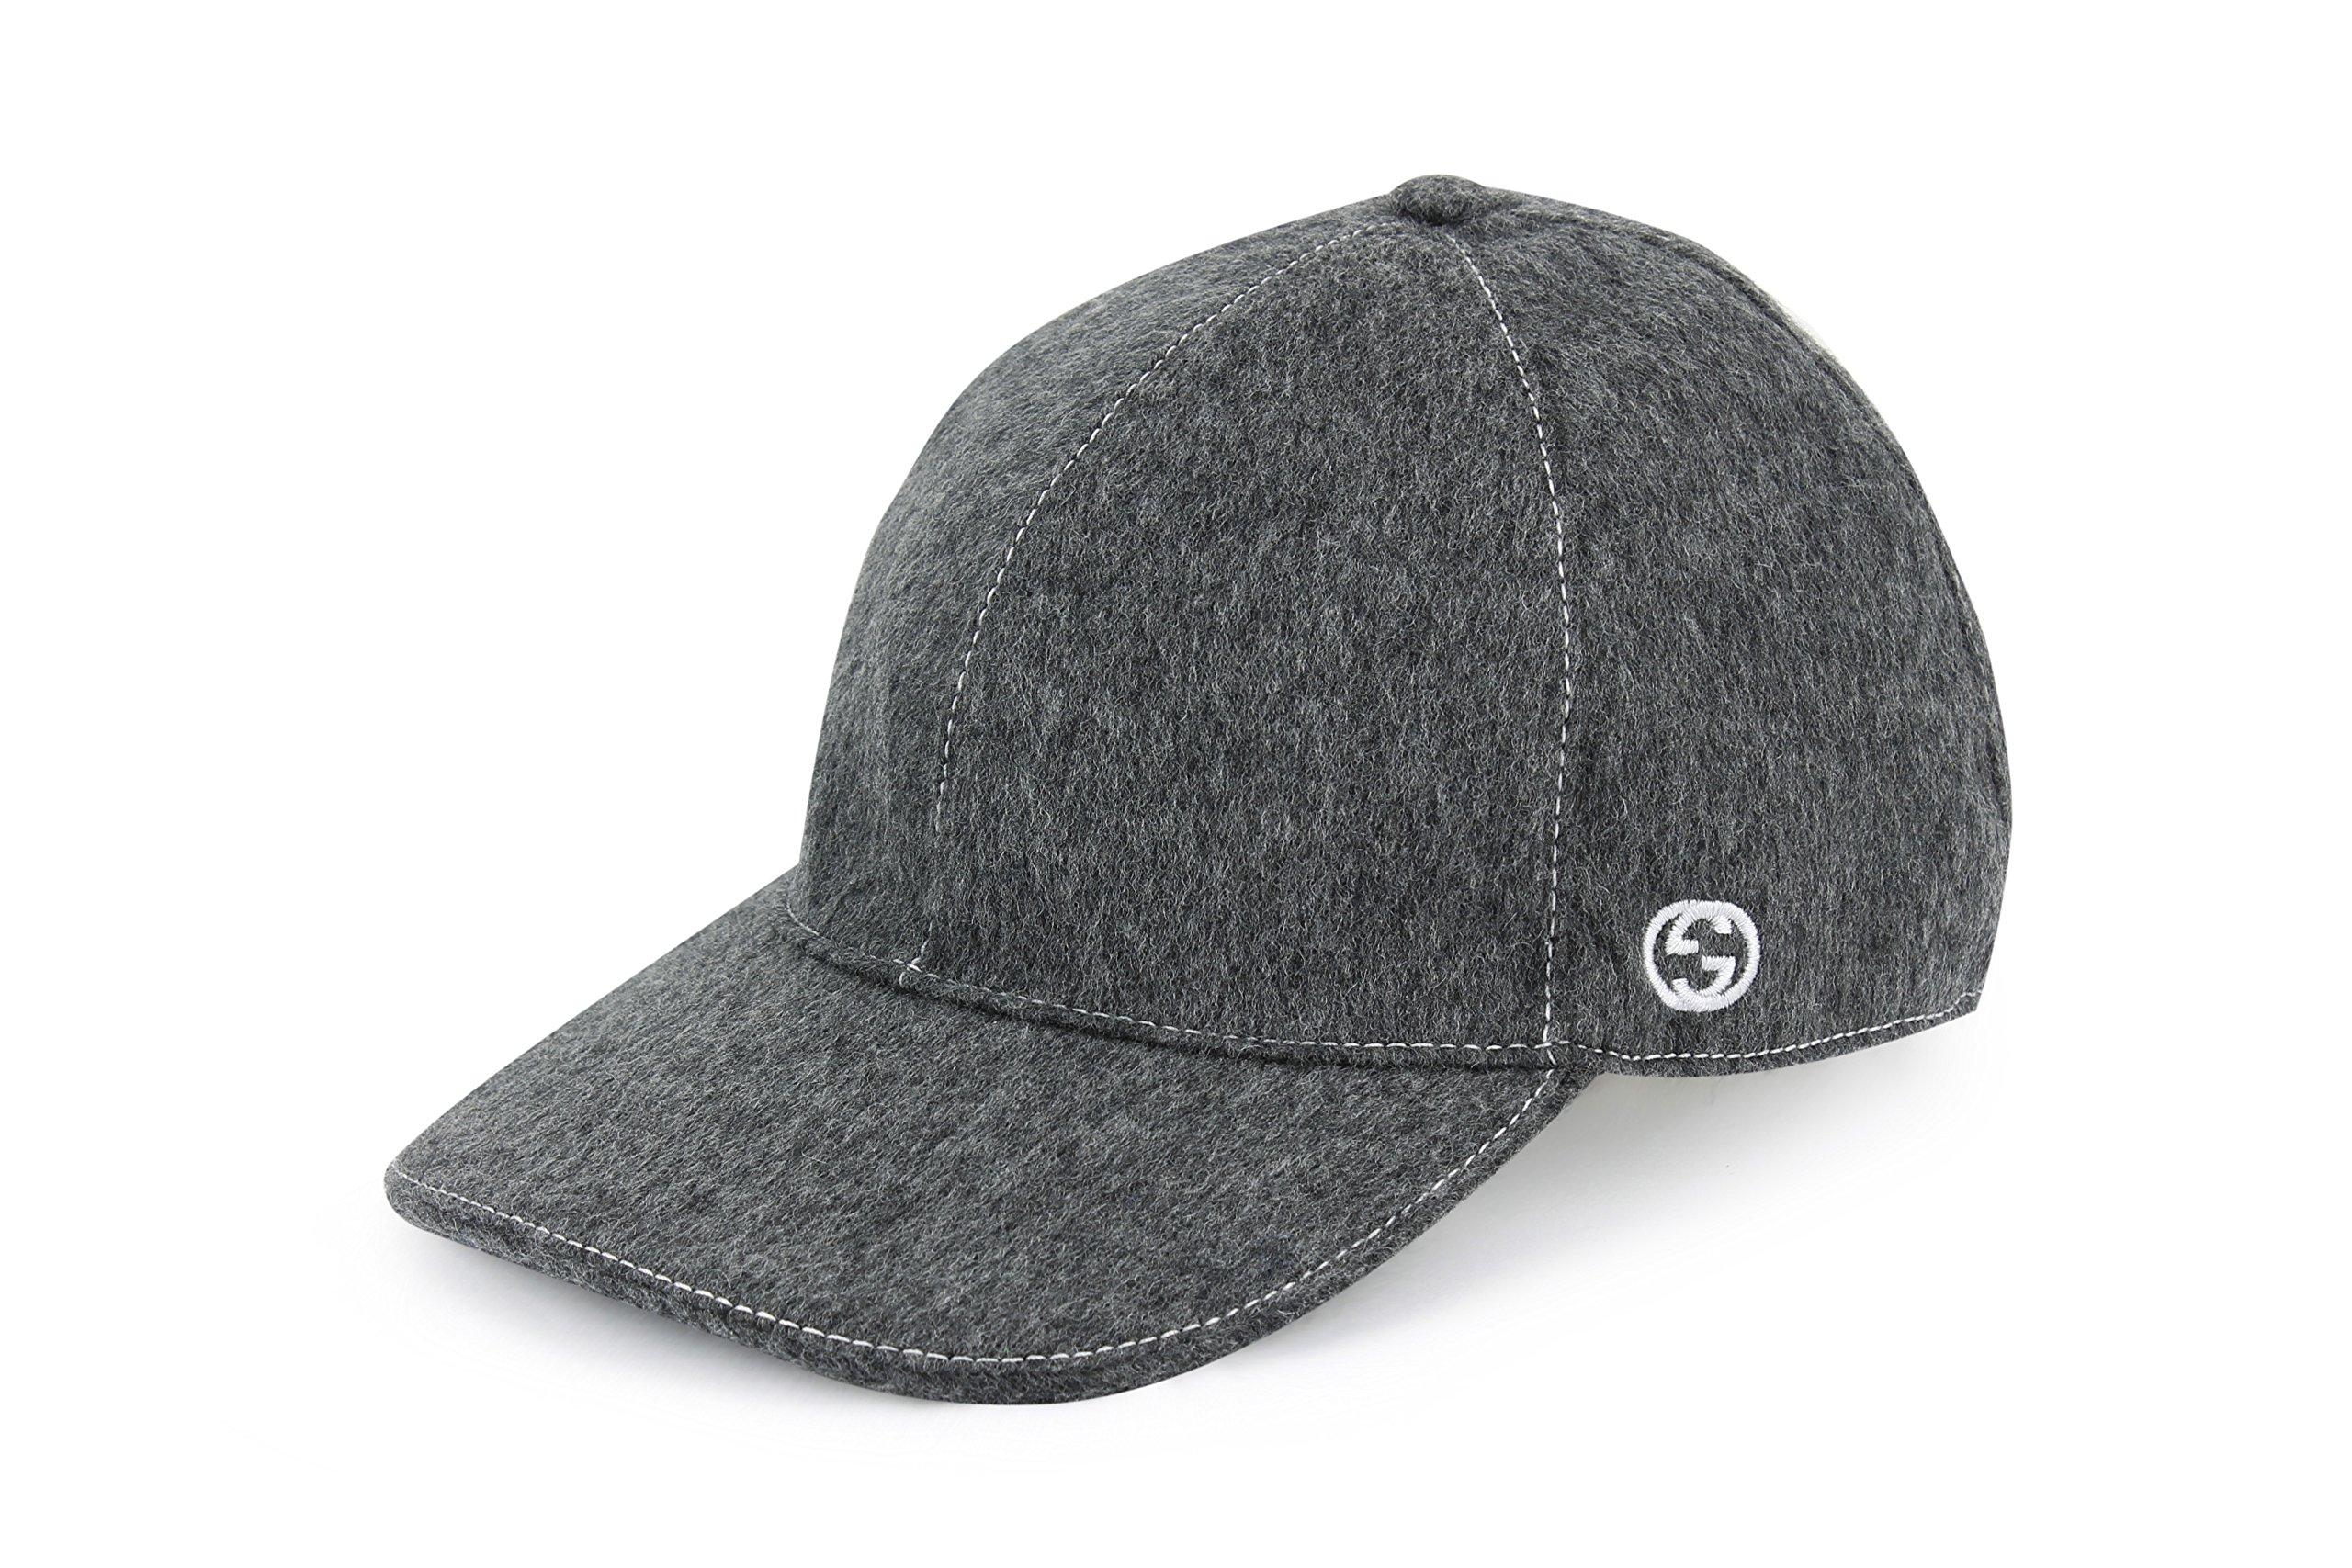 Gucci Wool Signature Web Stripe Baseball Cap, Charcoal 353505 (M (Medium))